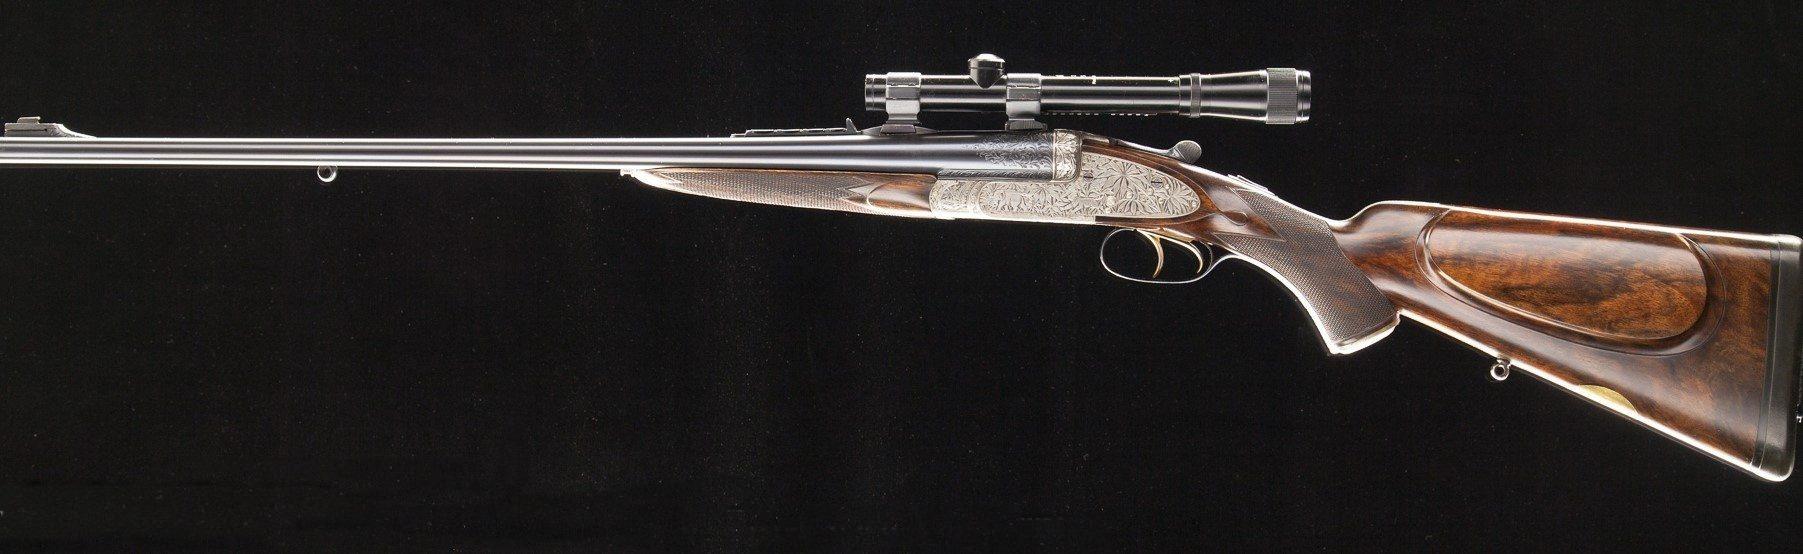 Rodda double rifle Mahraja of Panchkote